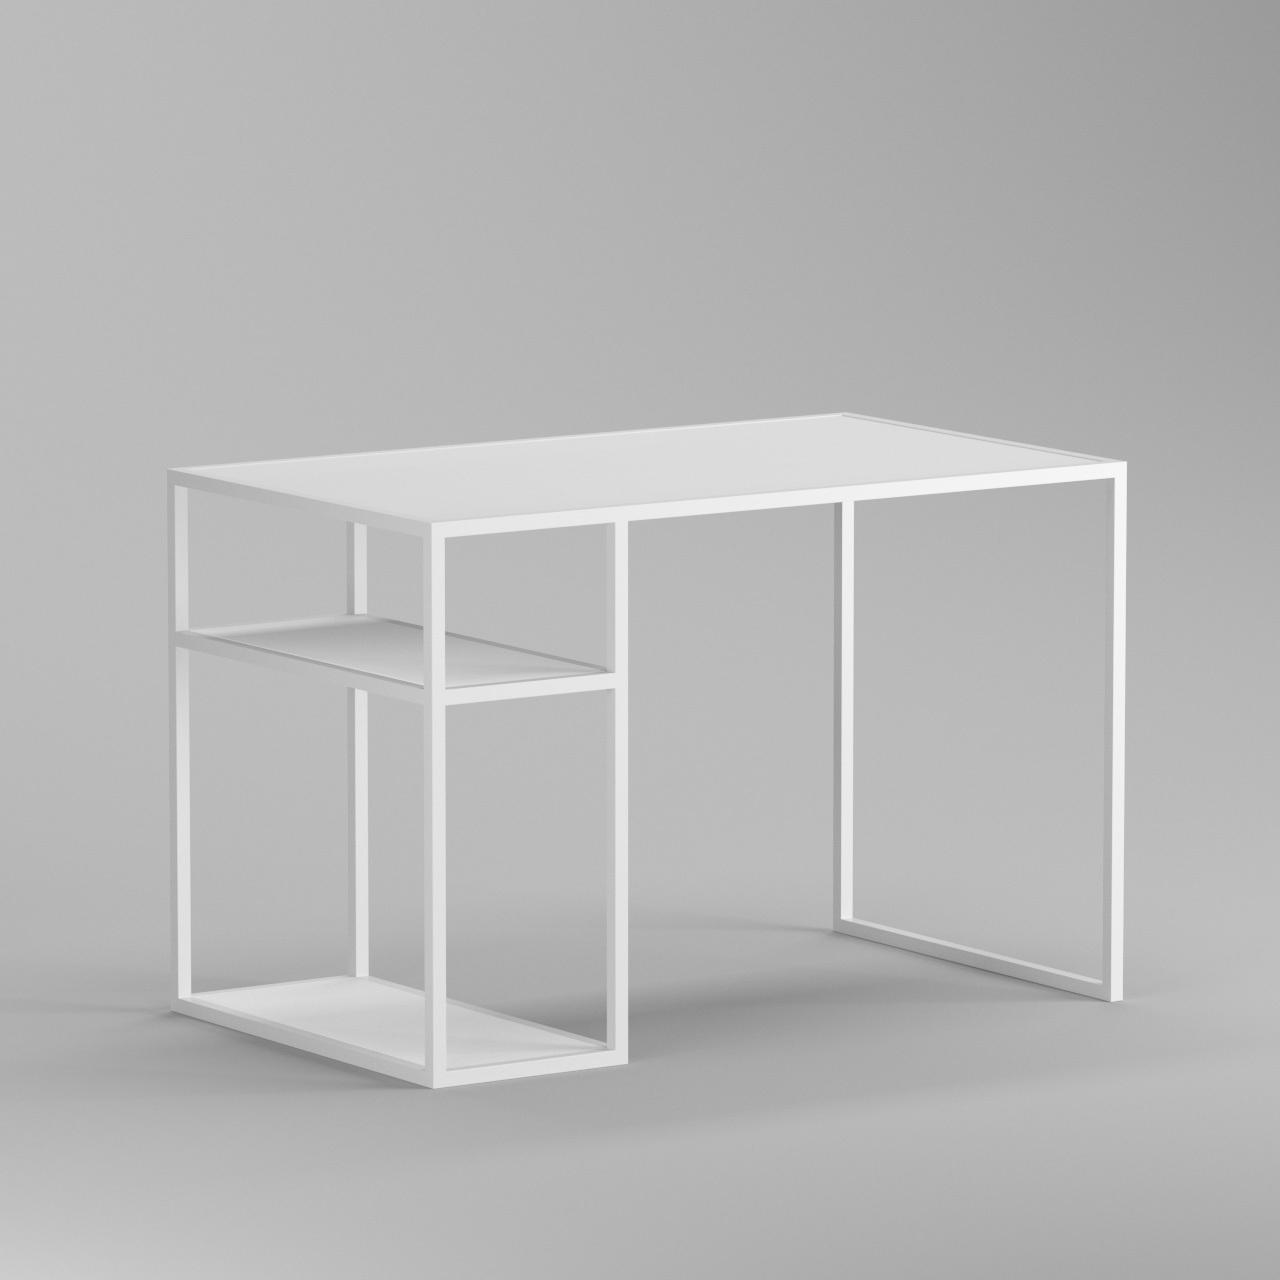 Рабочий стол Romero white - вид 1